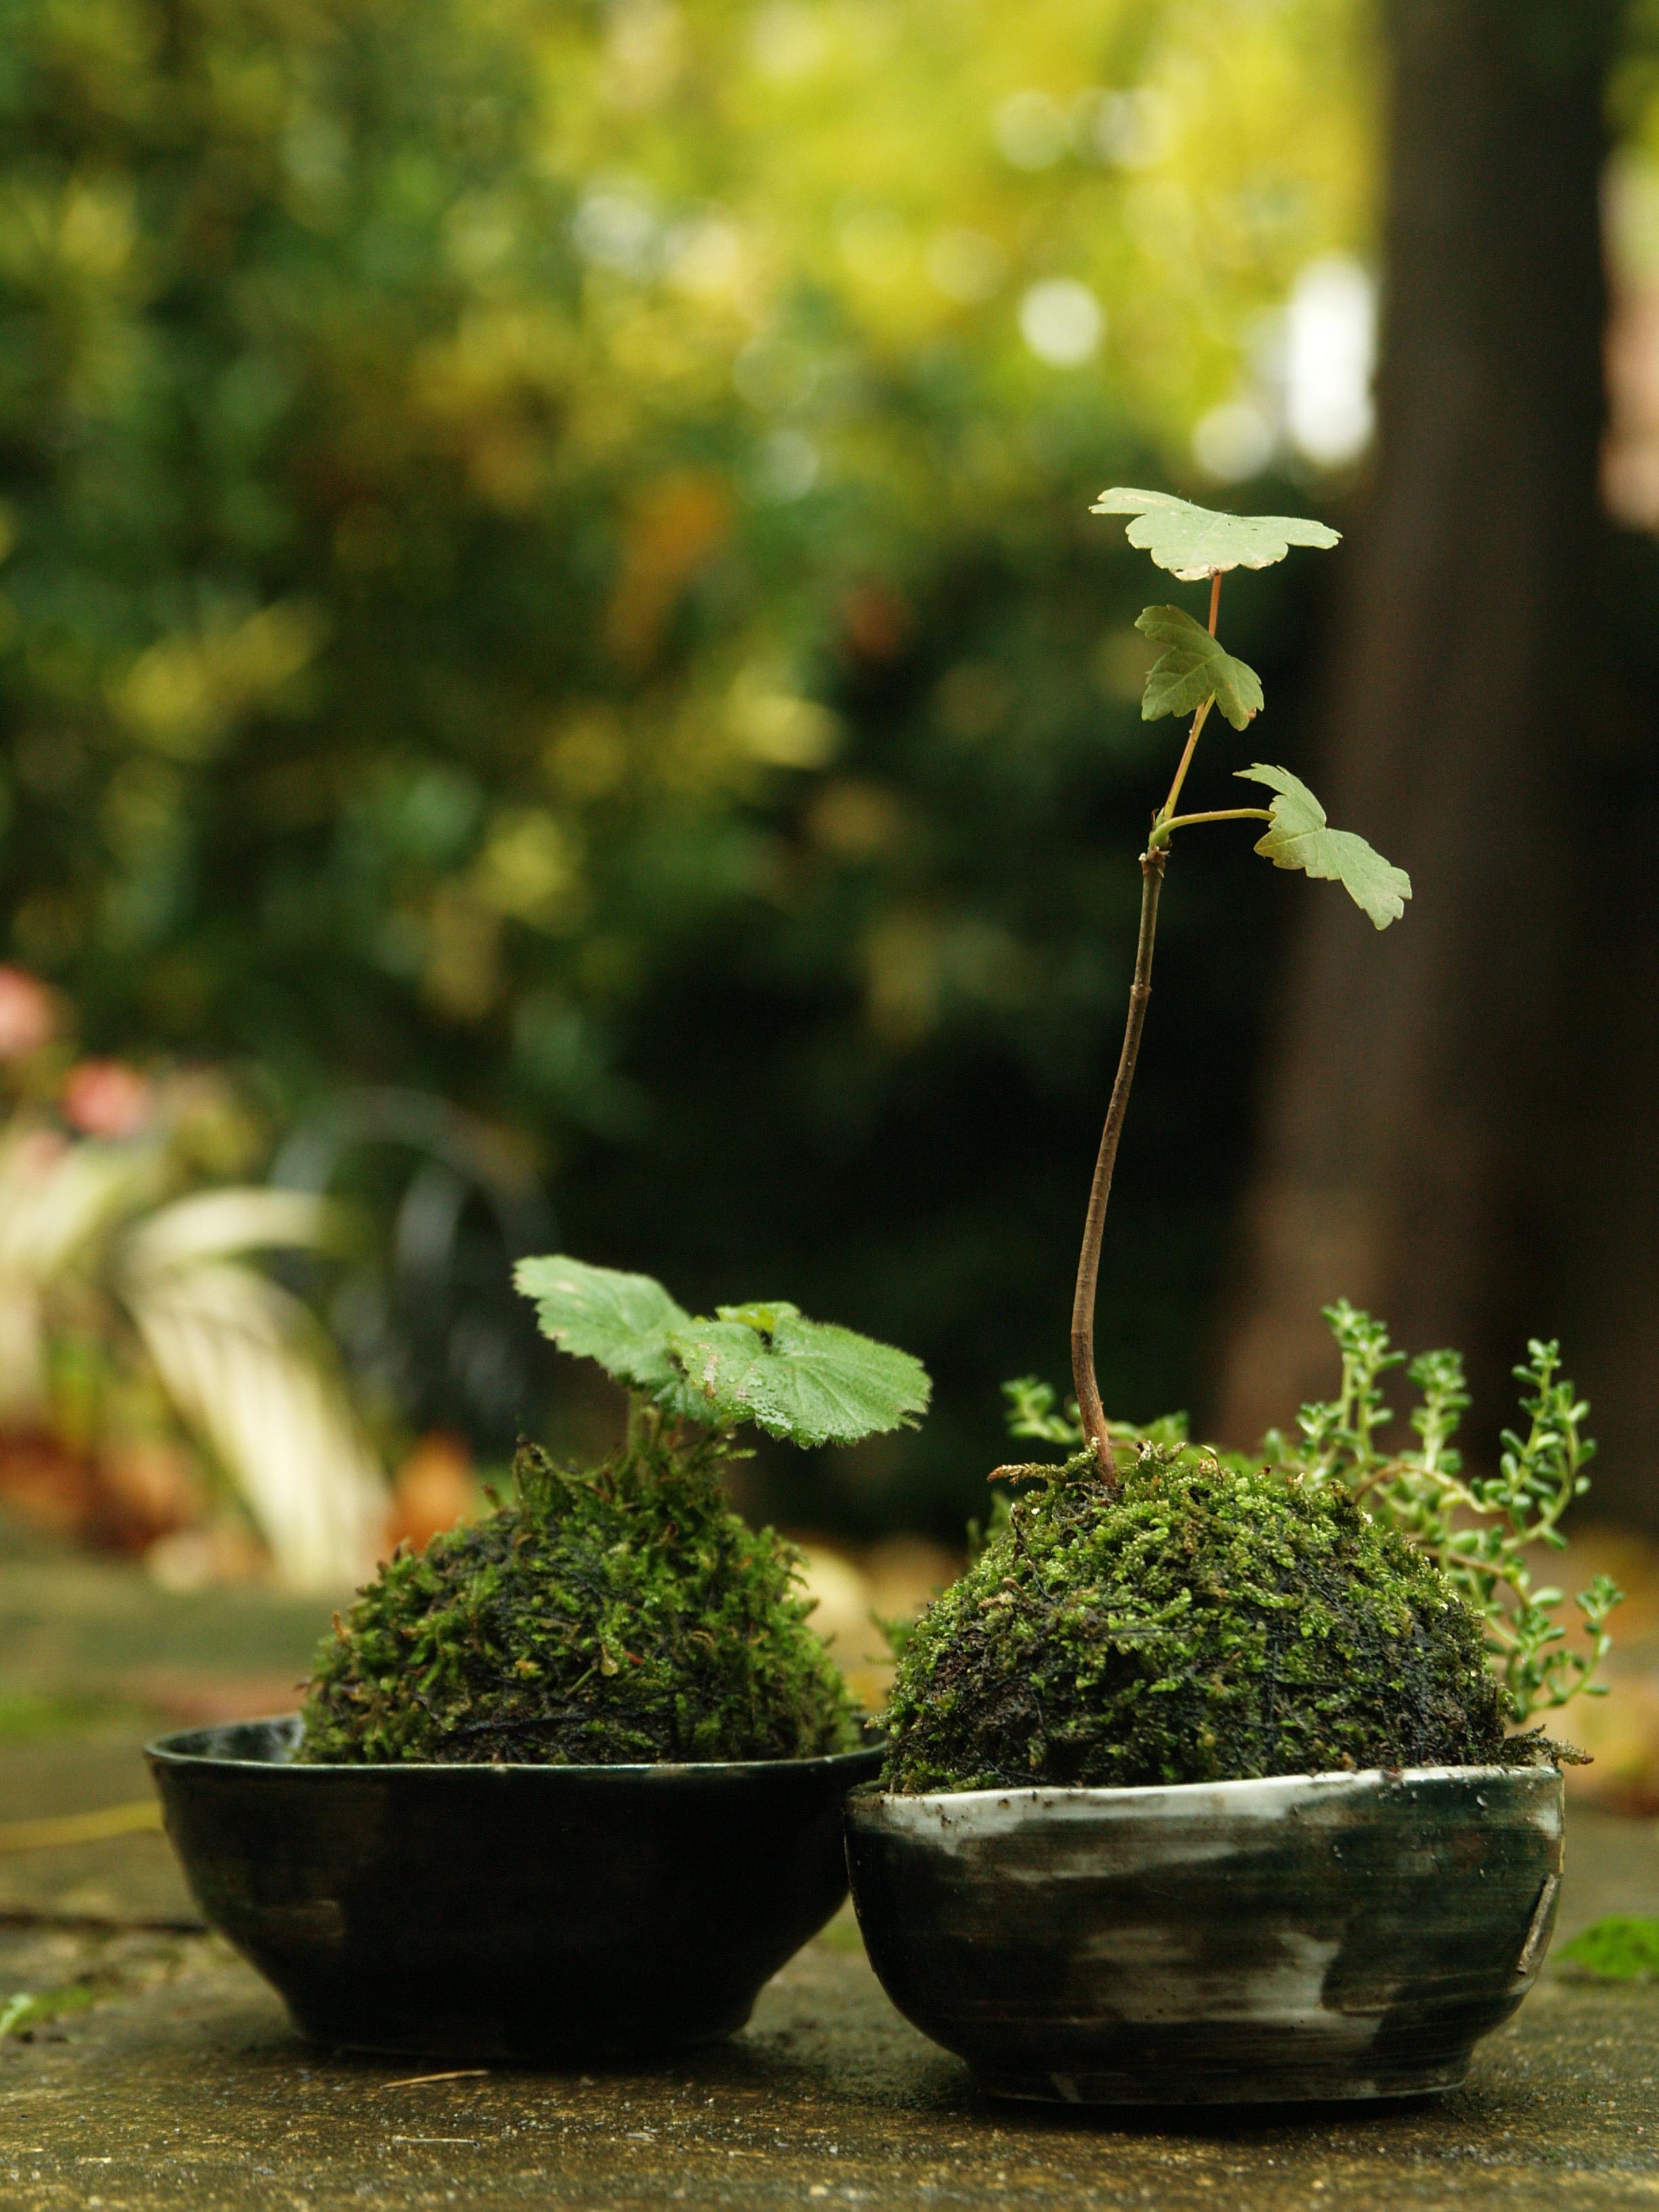 Kokedama with Green Ceramic Bowl